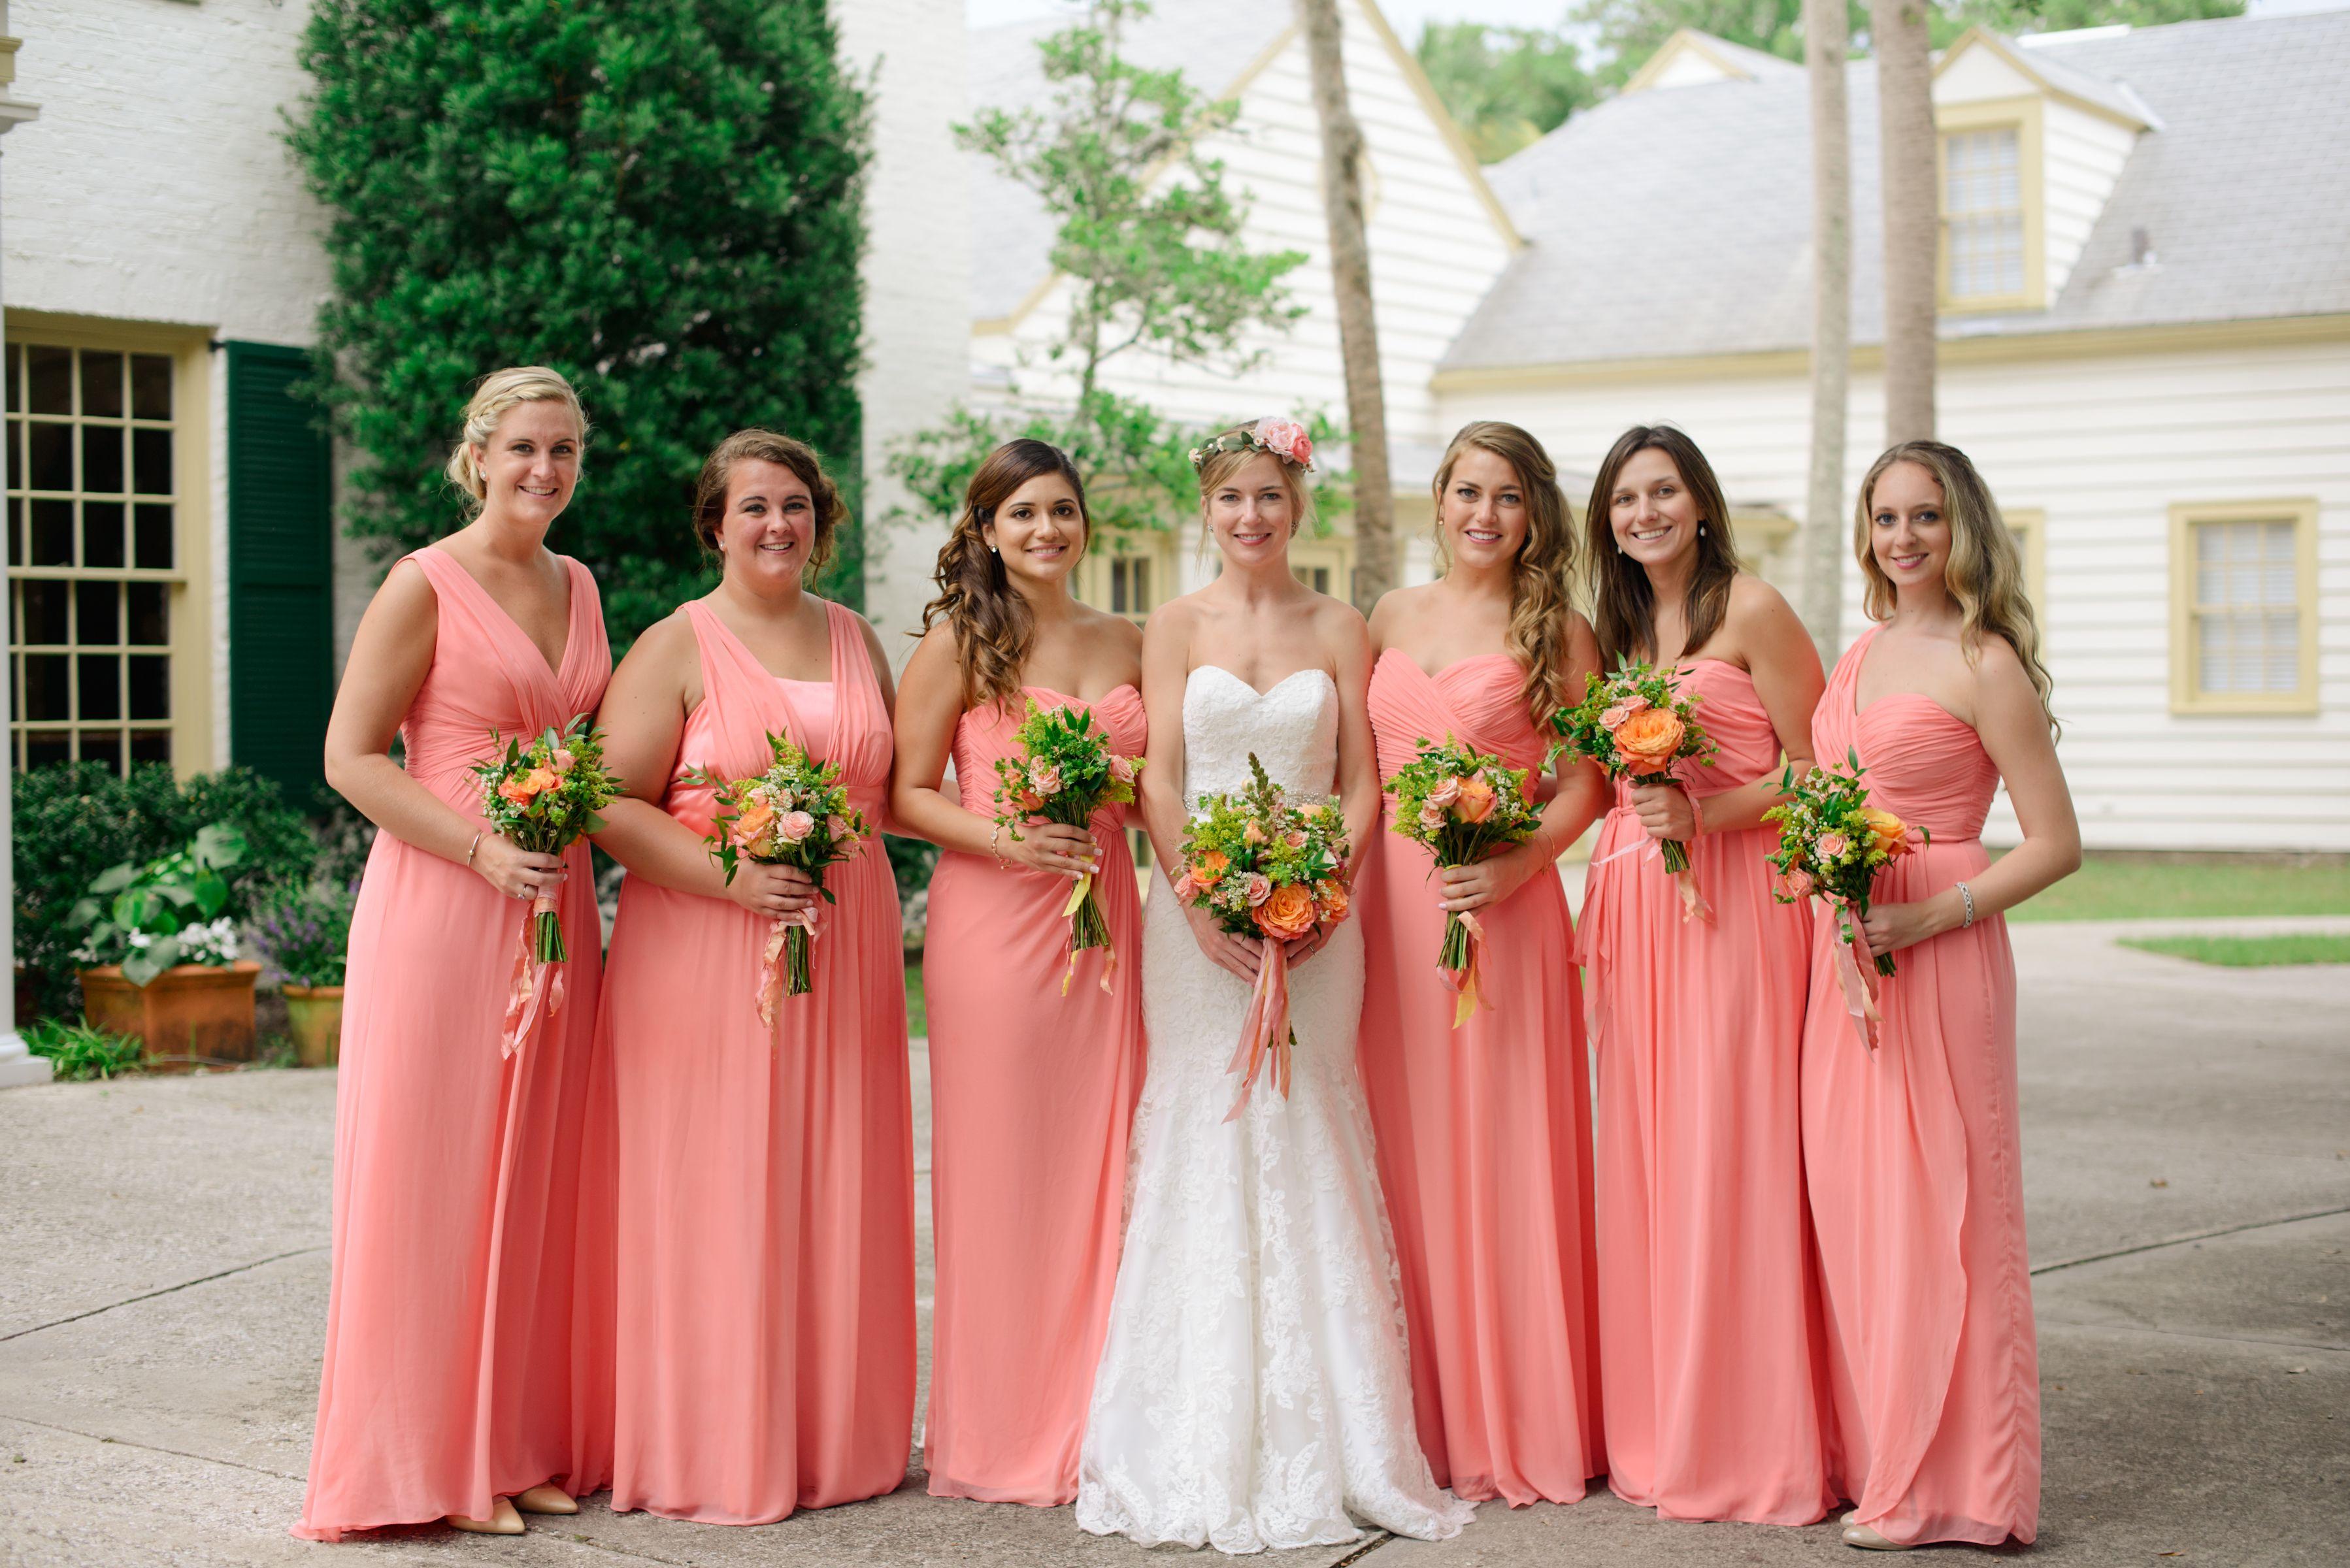 Salmon Bridesmaids Dresses Coral Bridesmaid Colored Wedding Color: Coral Pink Wedding Dresses At Websimilar.org